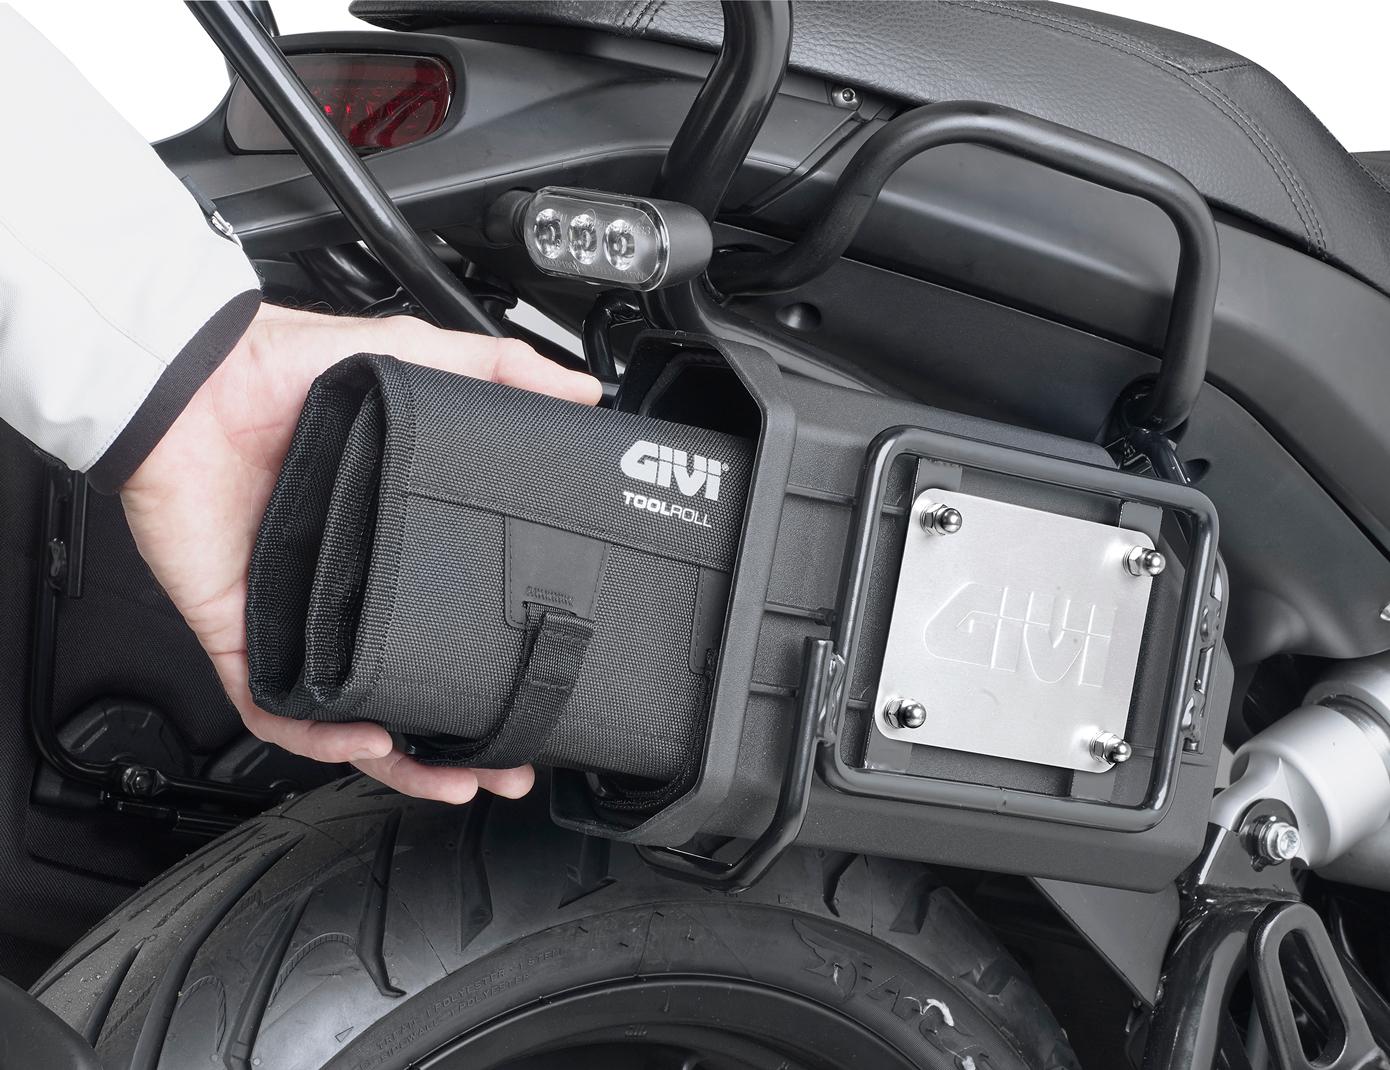 Givi Tool Box S250